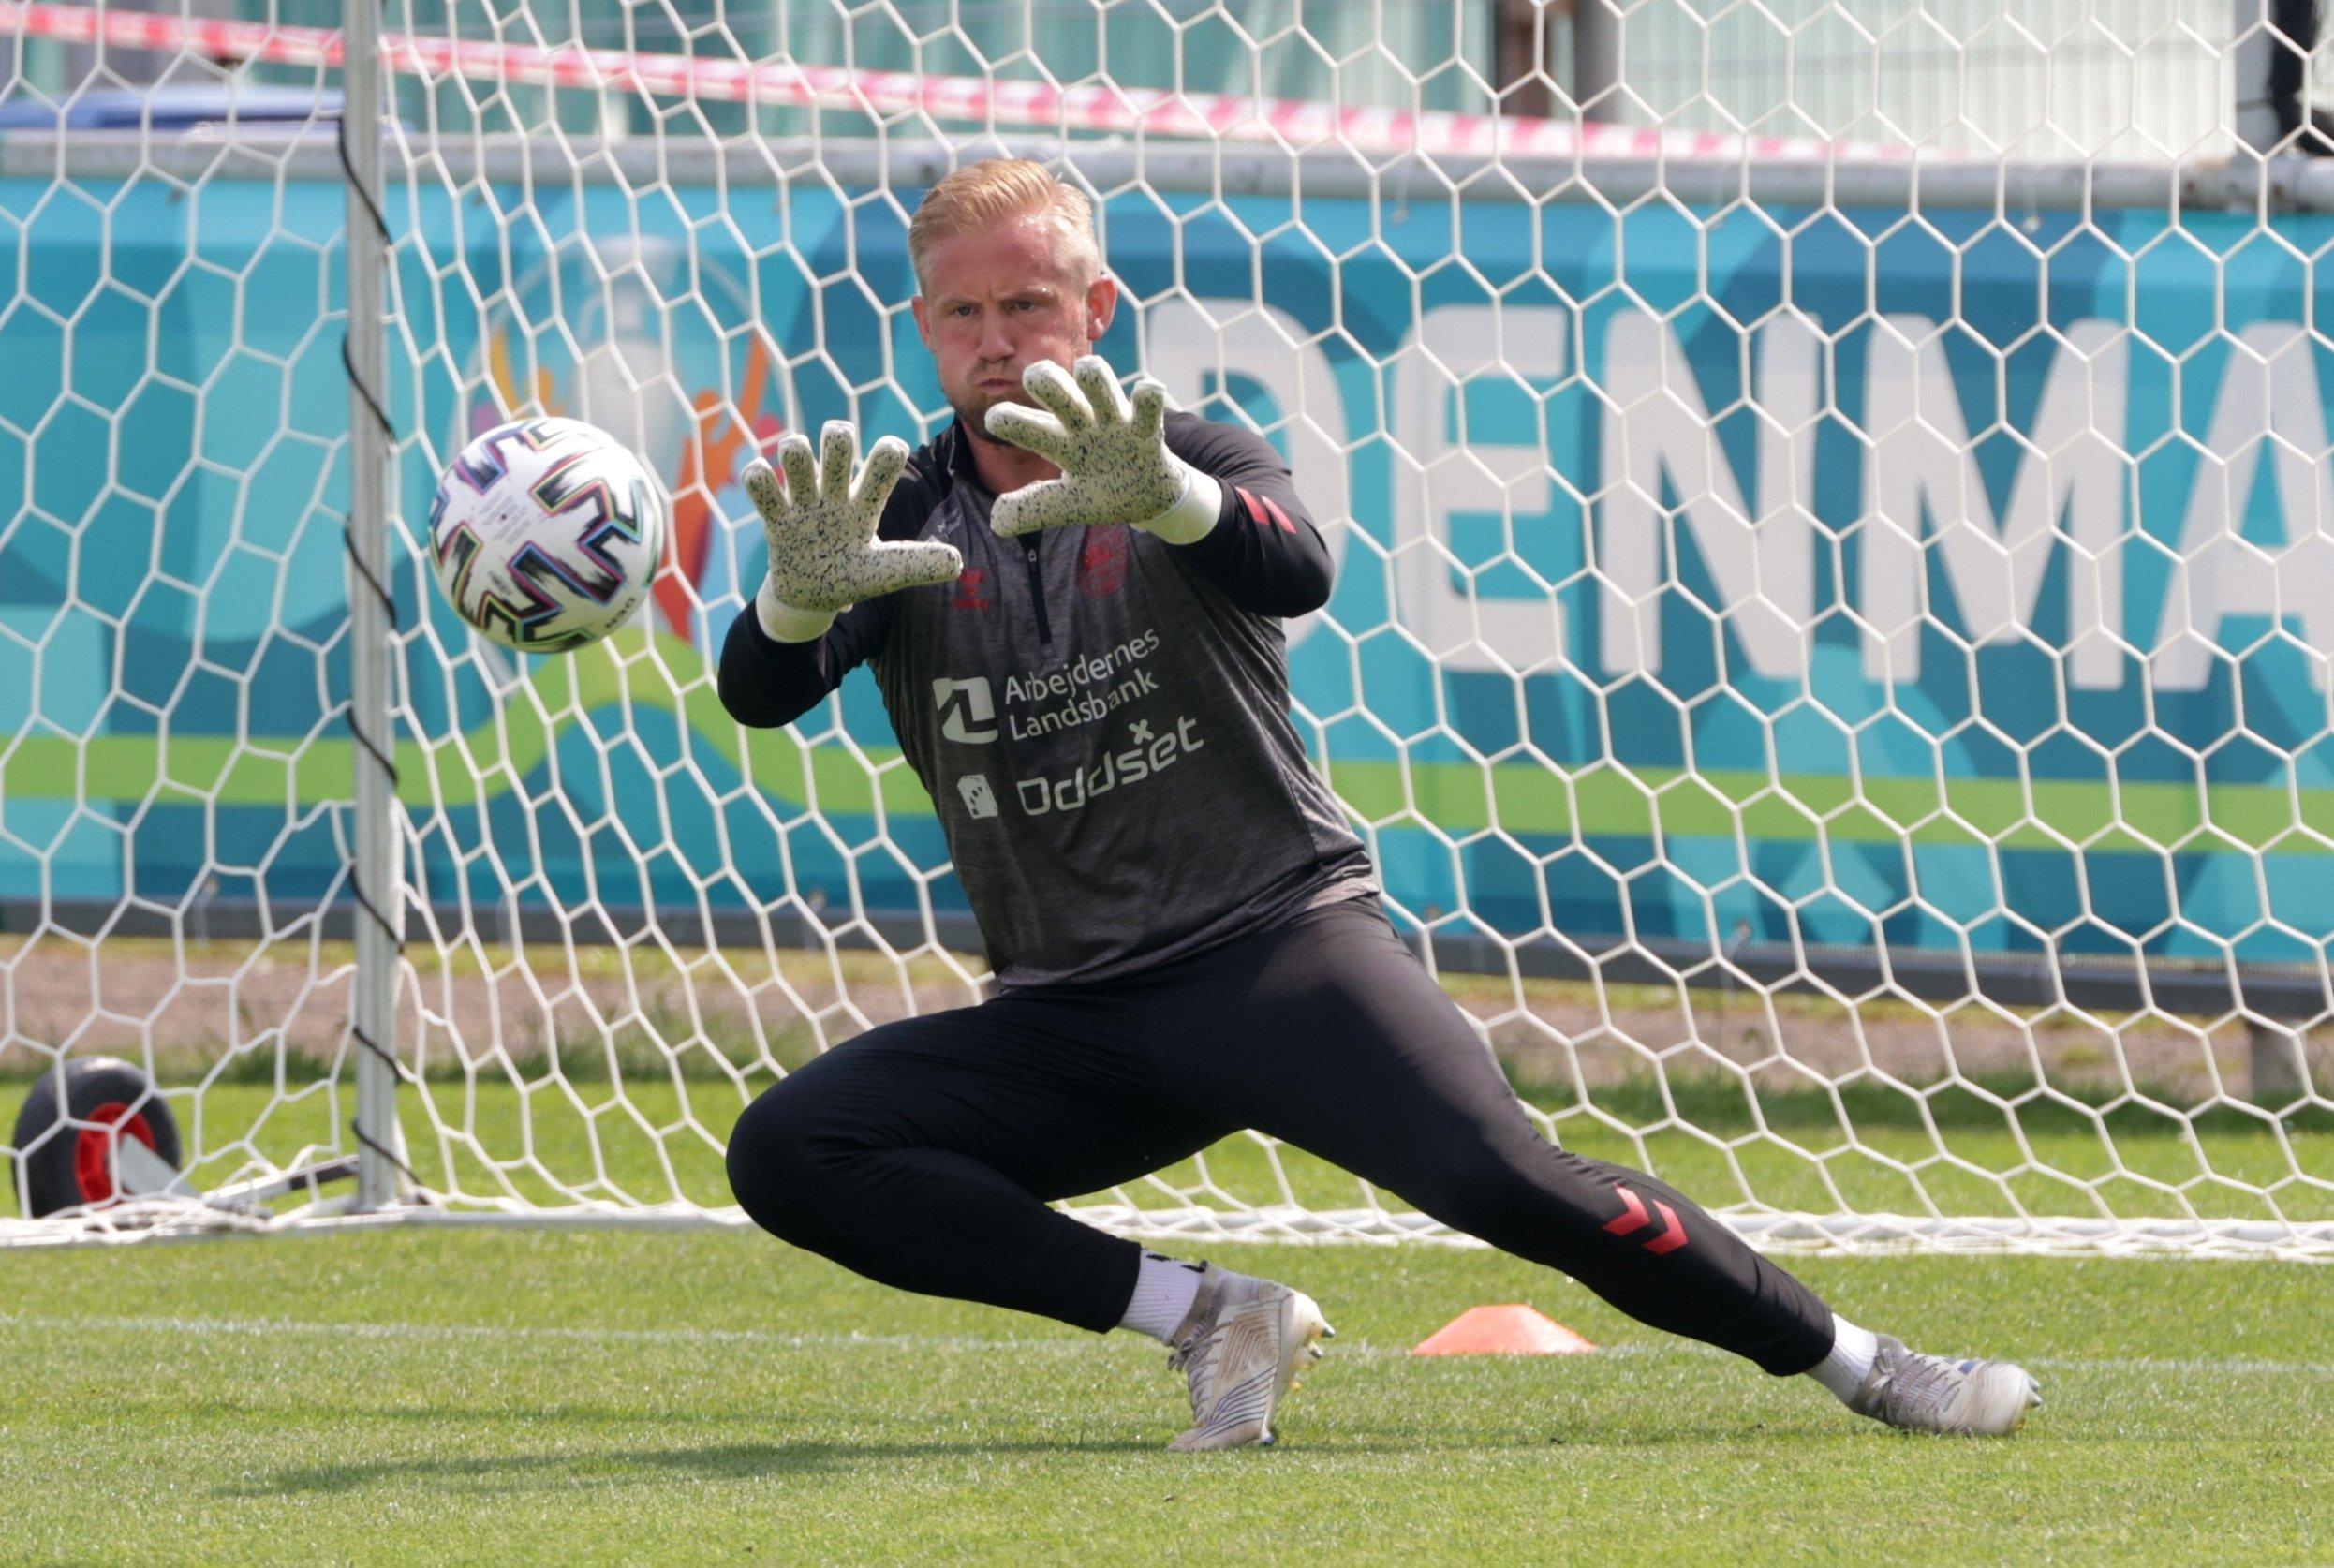 Denmark's Kasper Schmeichel during training in Helsingor, Denmark, June 19, 2021. (Reuters Photo)